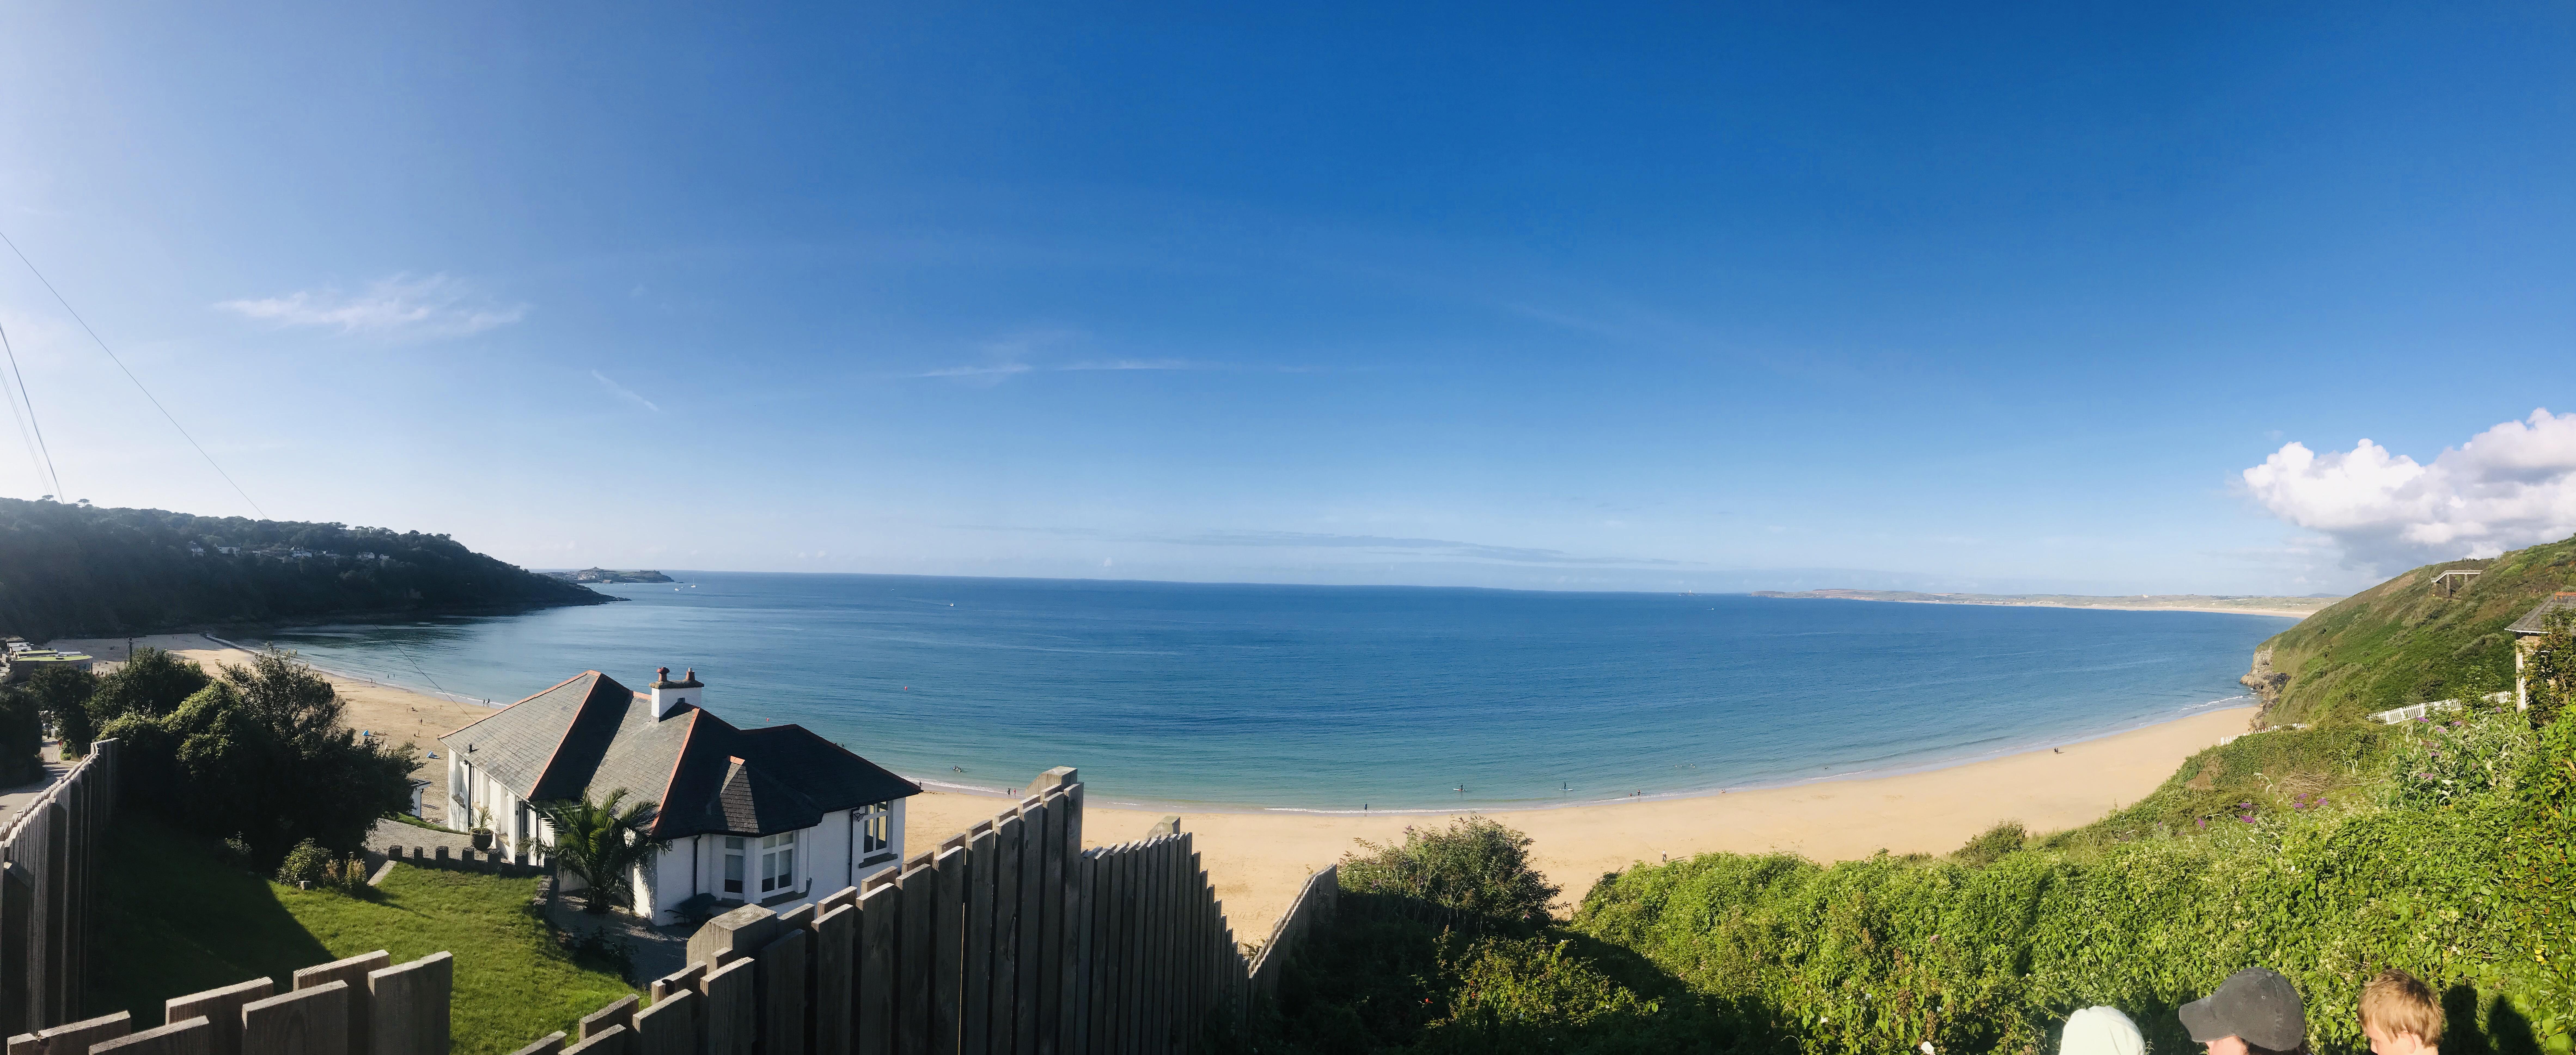 nay nays adventure - Cornish bucket list beaches